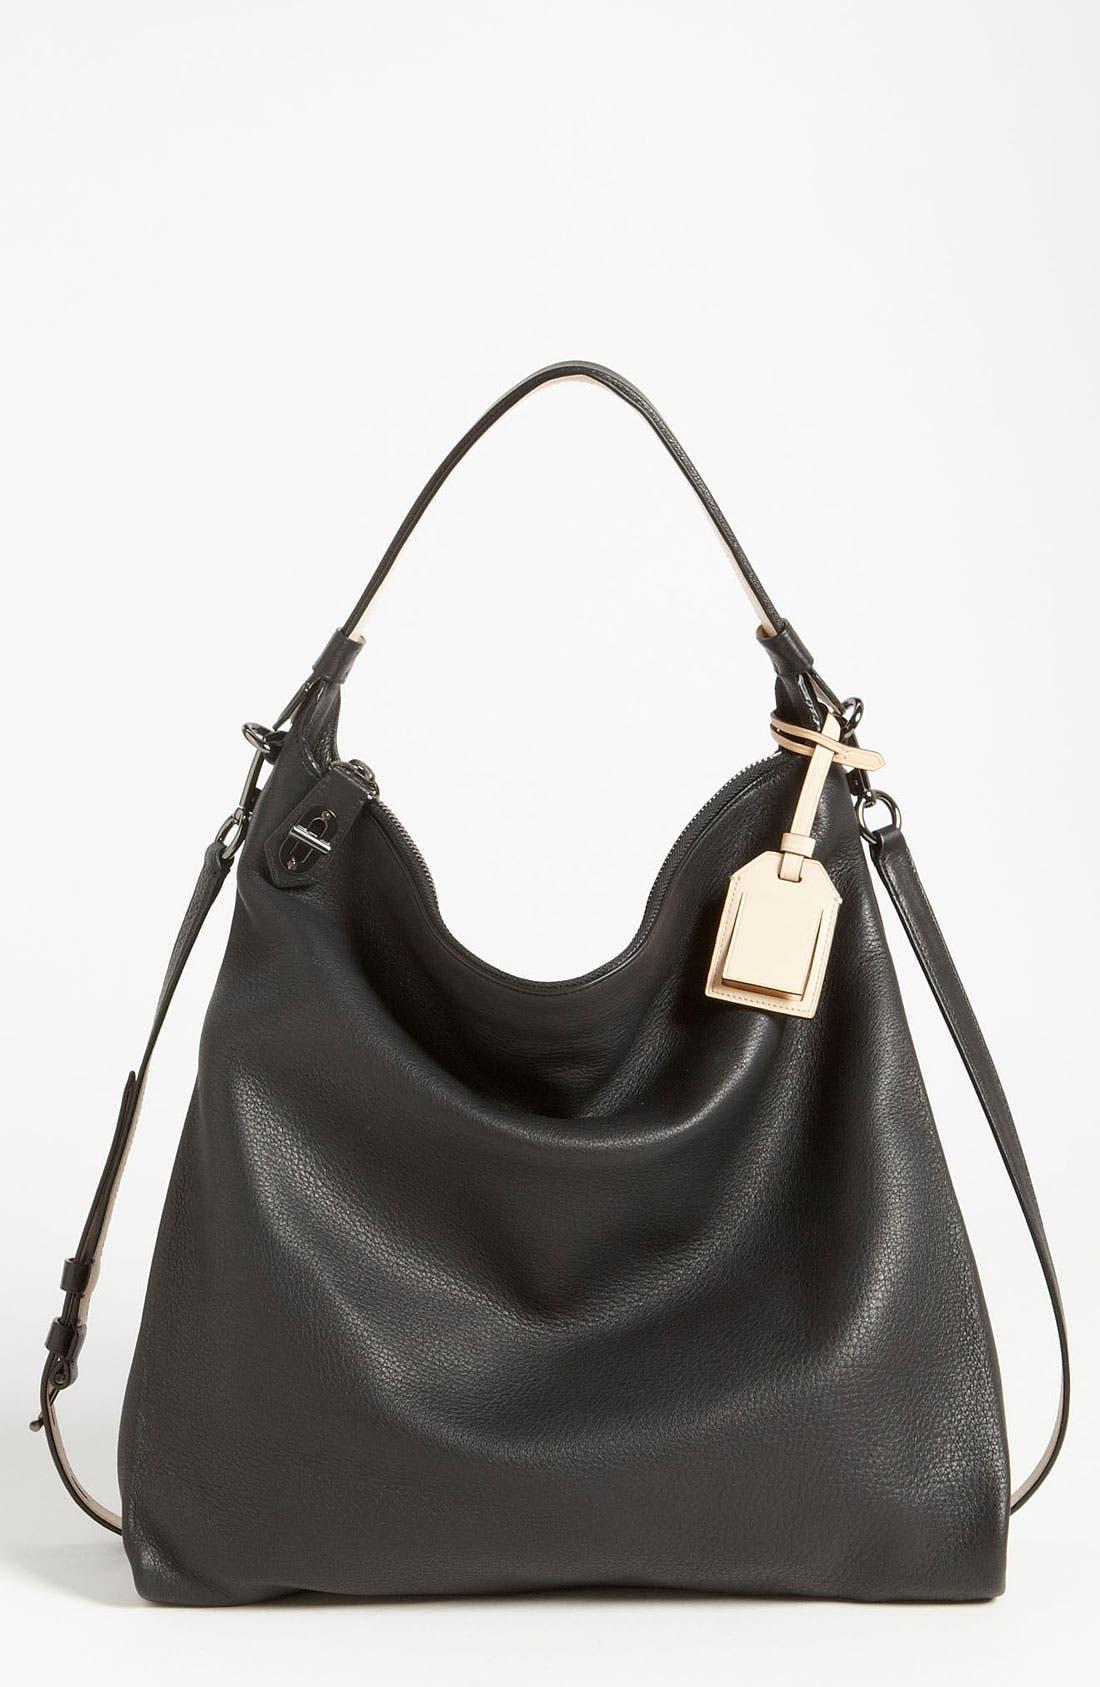 Alternate Image 1 Selected - Reed Krakoff 'Standard' Leather Hobo